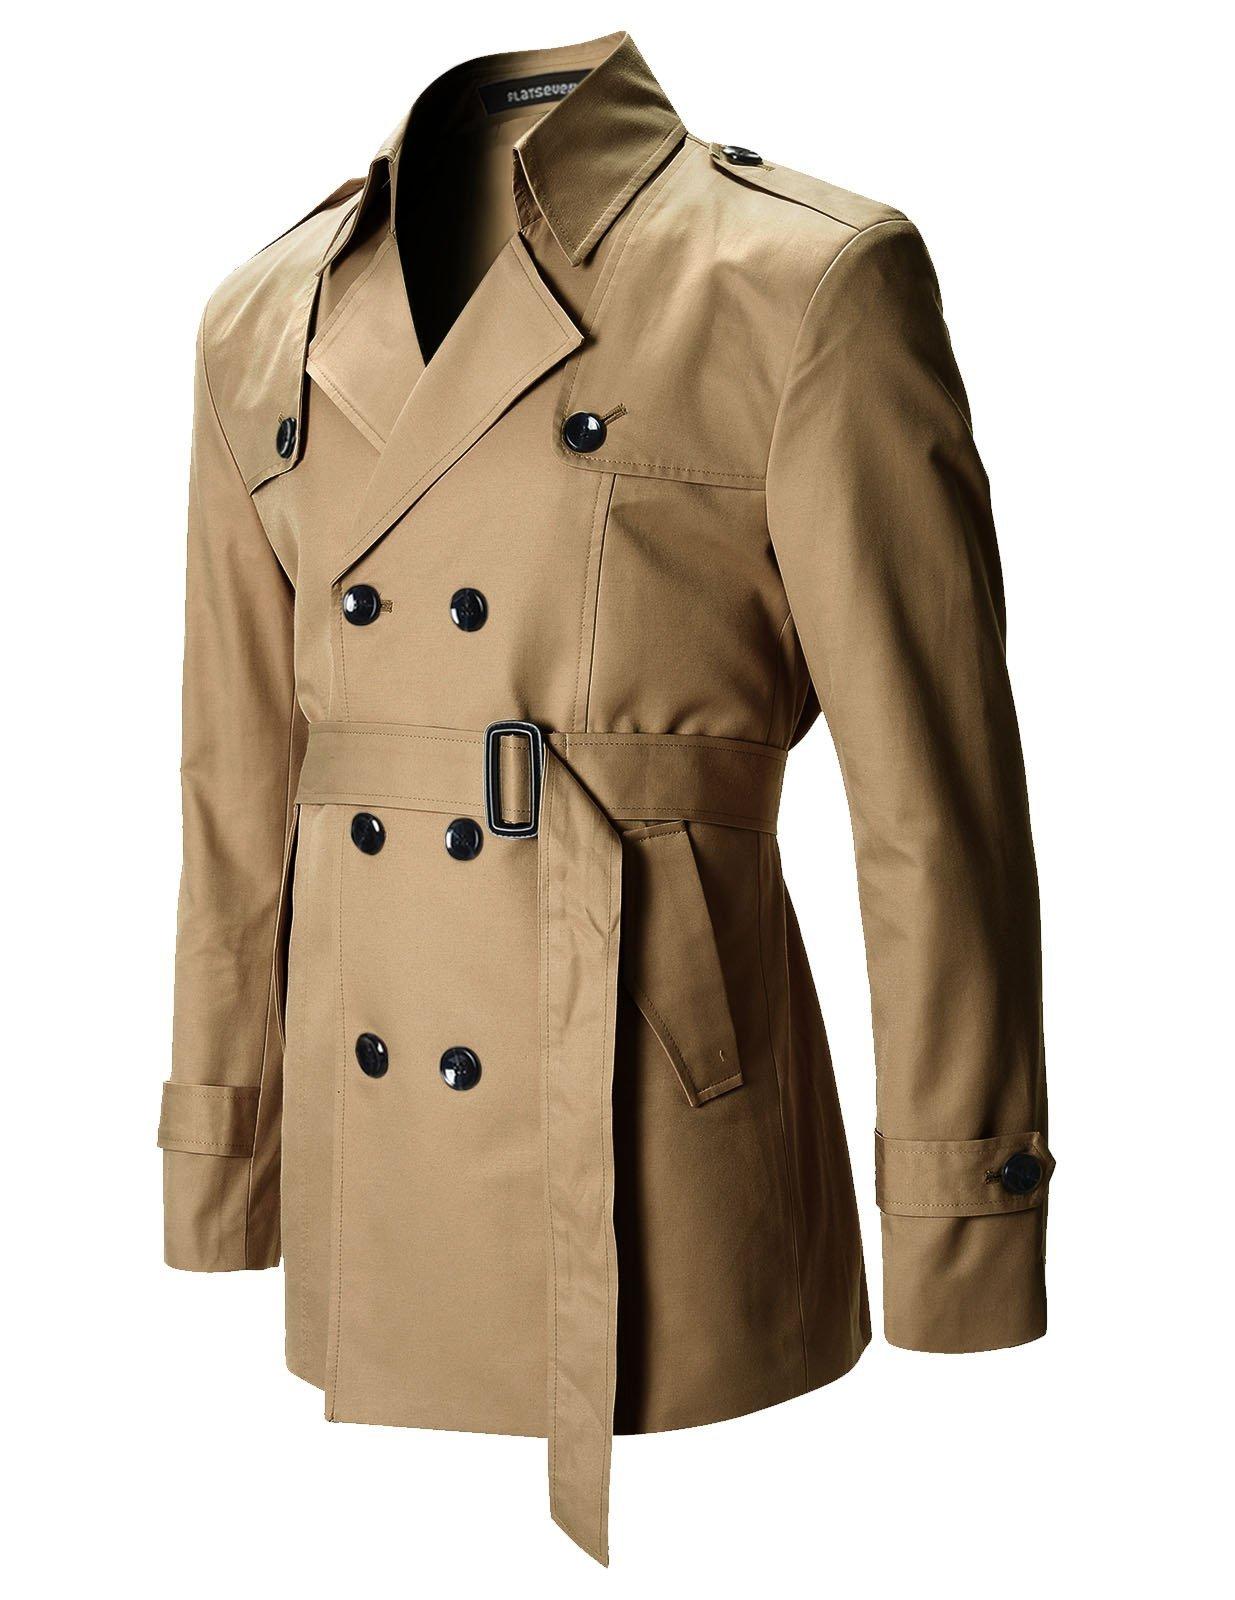 FLATSEVEN Mens Slim Fit Designer Casual Trench Coat (FCT201) Dark Beige, Size XL by FLATSEVEN (Image #2)